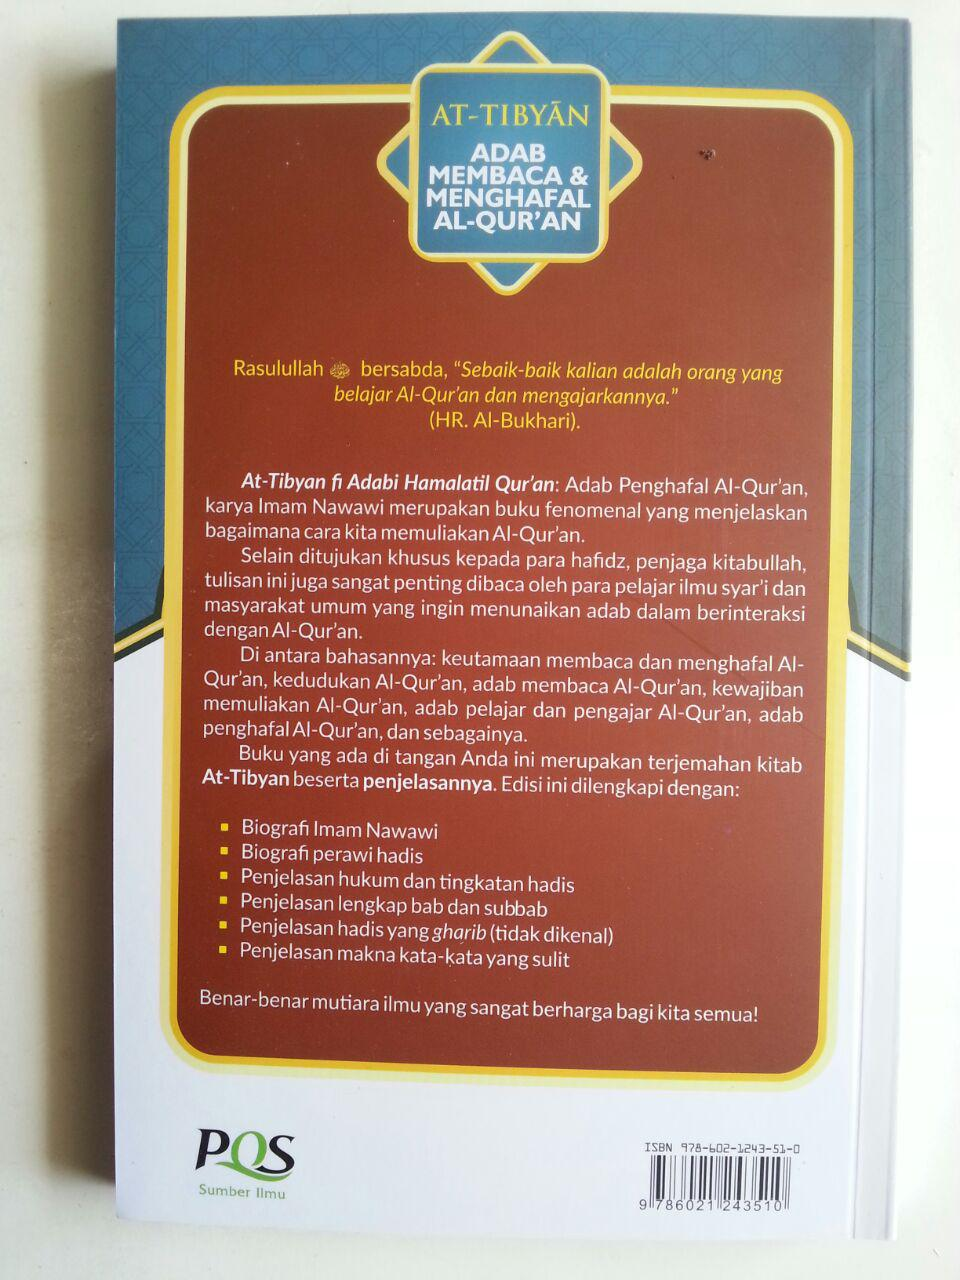 Buku At-Tibyan Adab Membaca Dan Menghafal Al-Qur'an cover